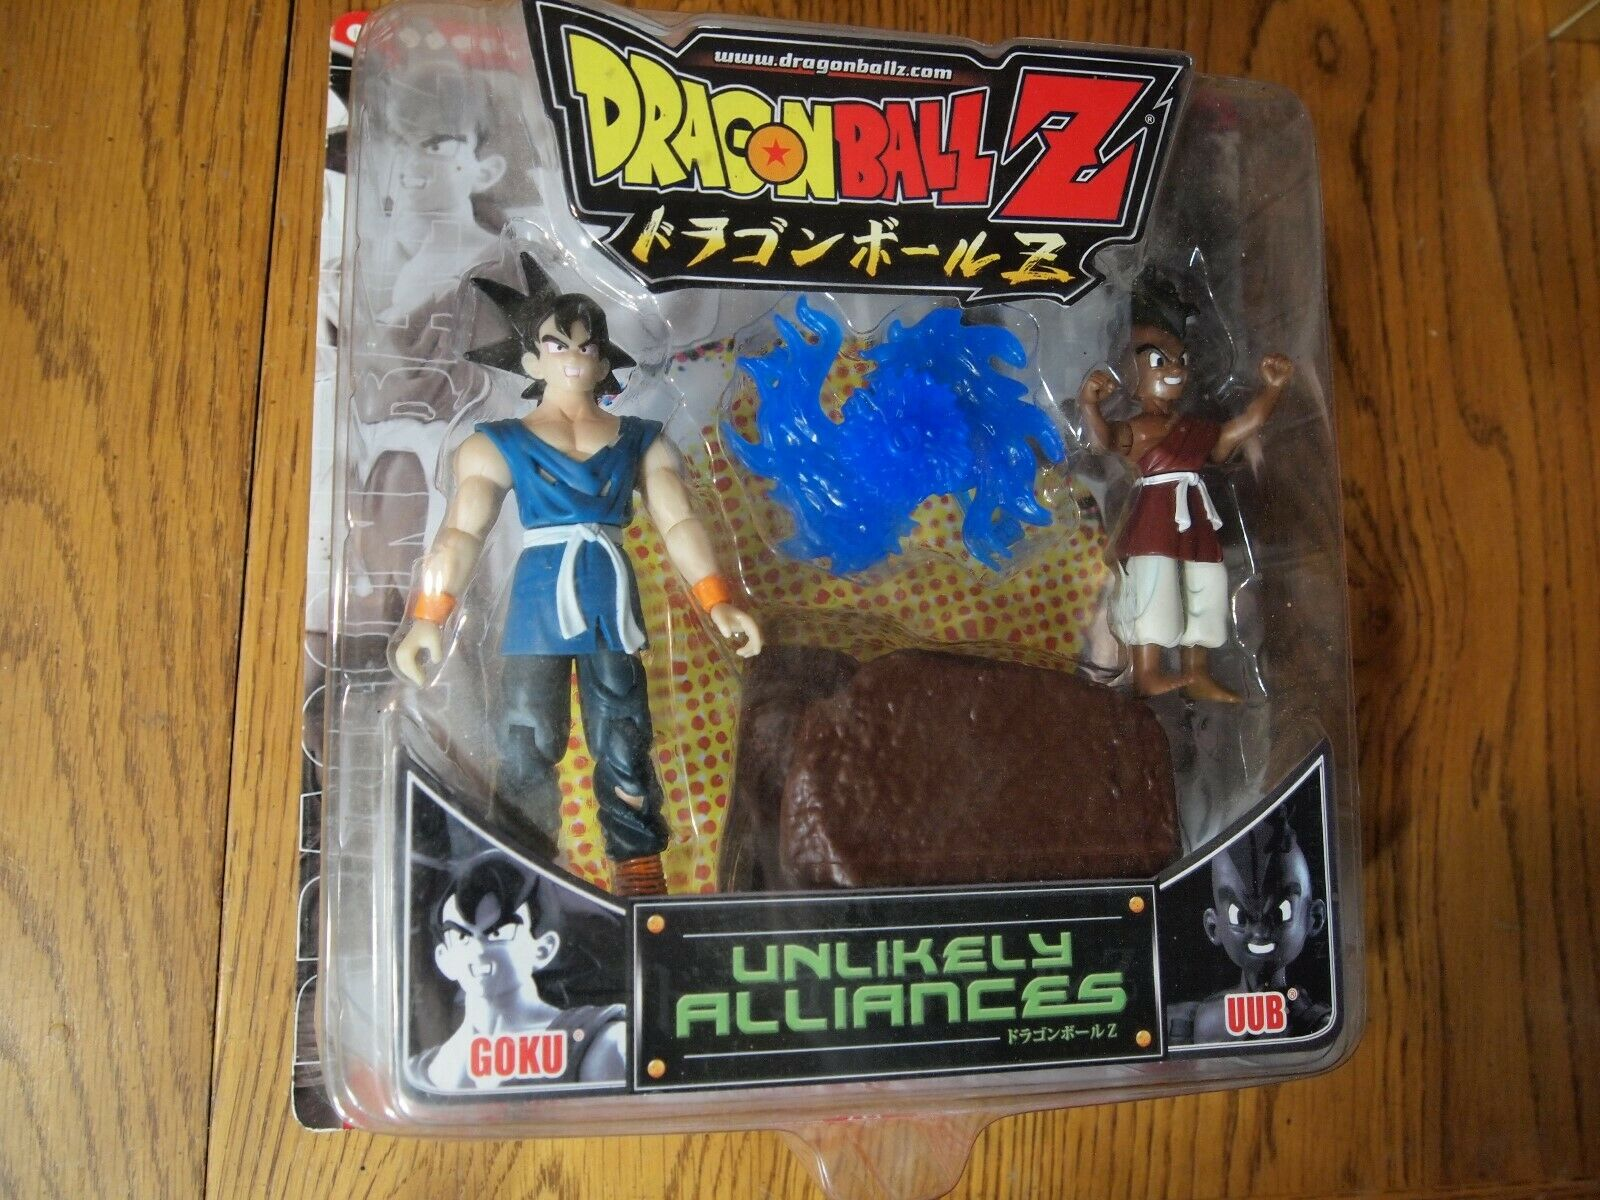 Jakks Pacific 2006 Dragonball Z Unlikely Alliances Goku & Uub figure set, MOC